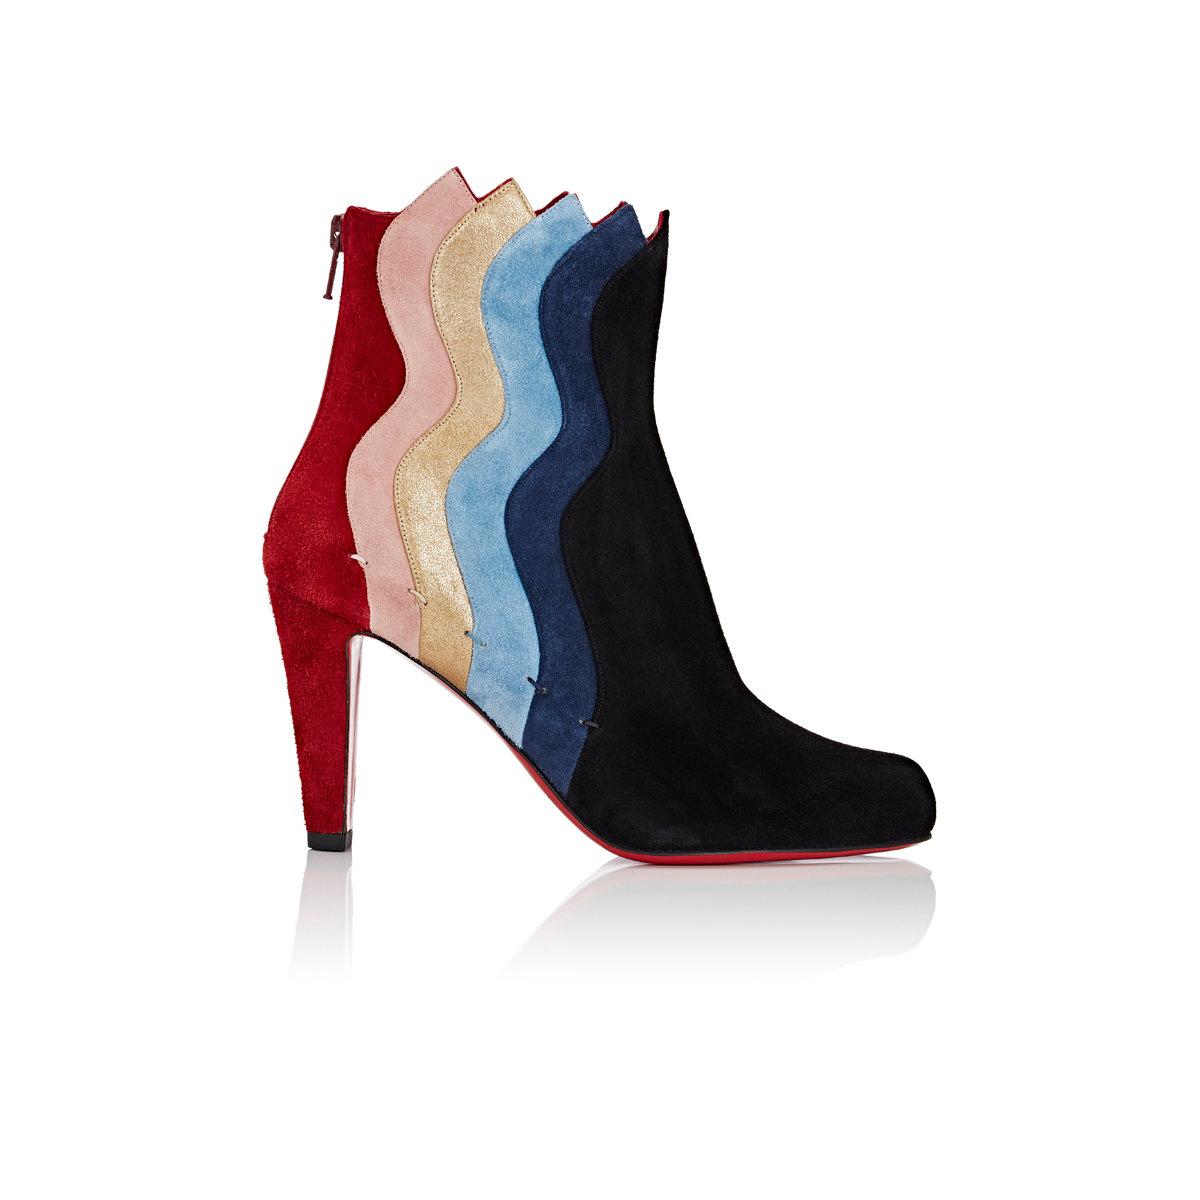 Louboutin Shoes Wavy Heel